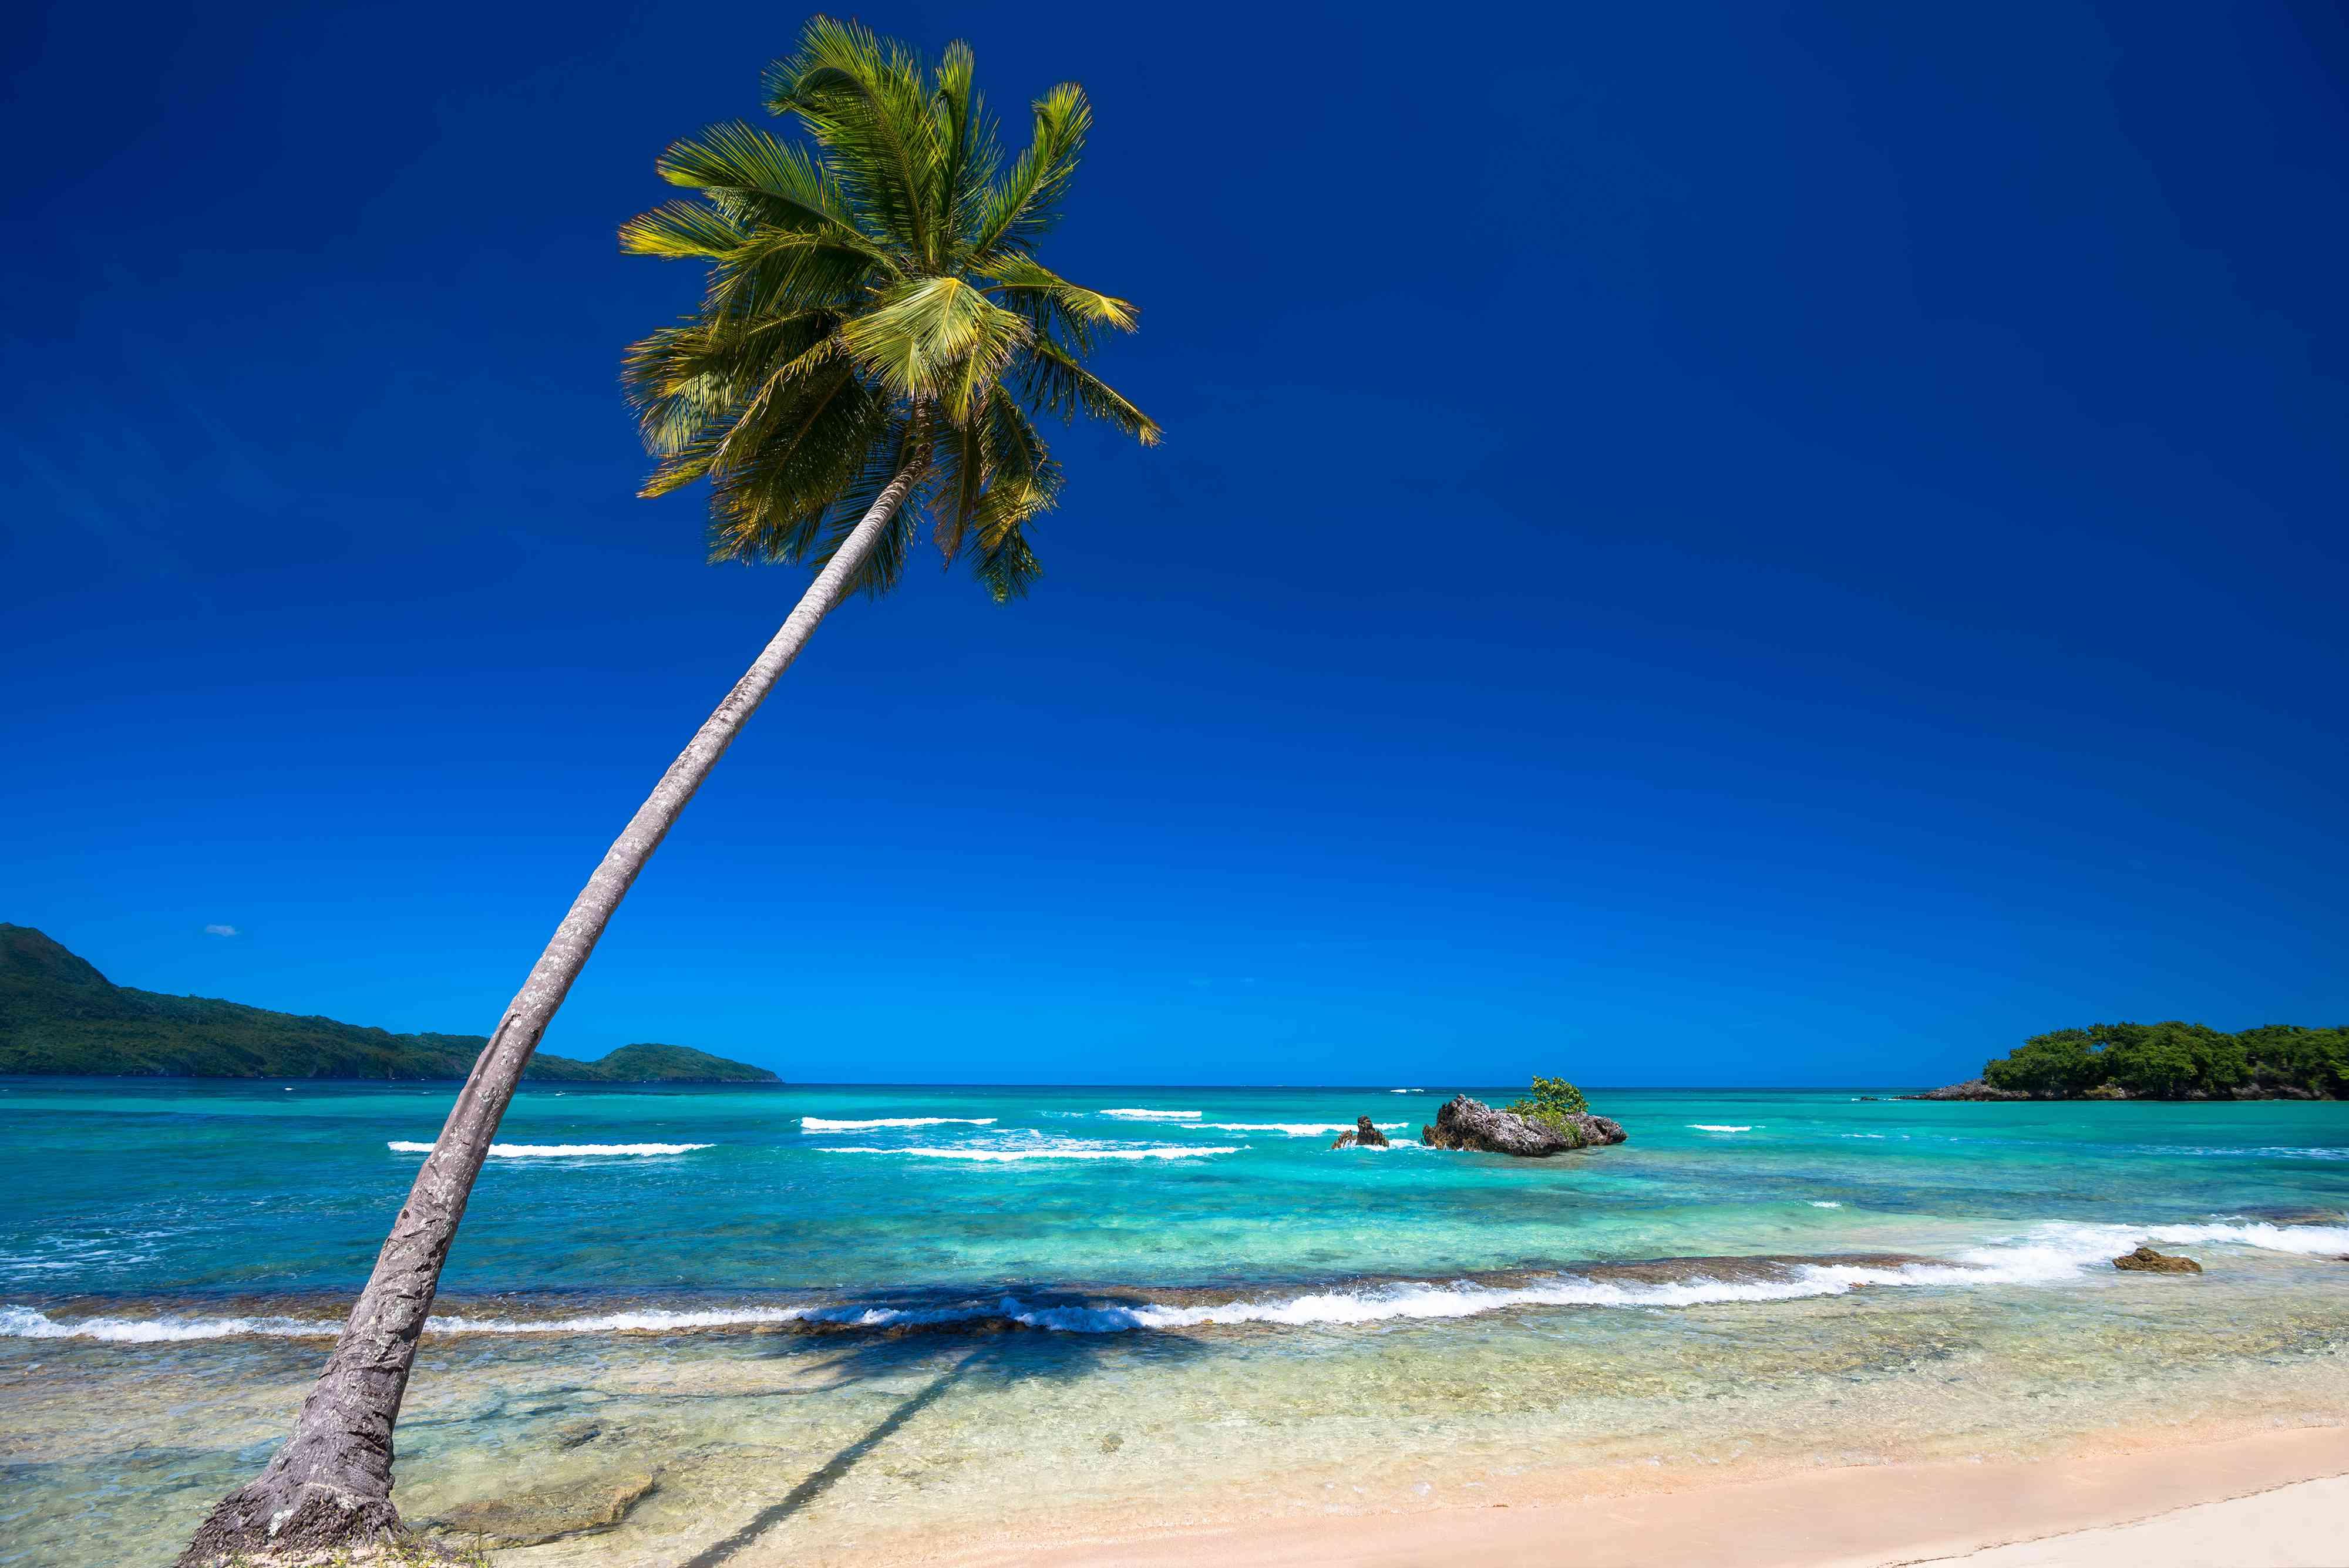 Paradise beach Playa Rincon, Dominican Republic